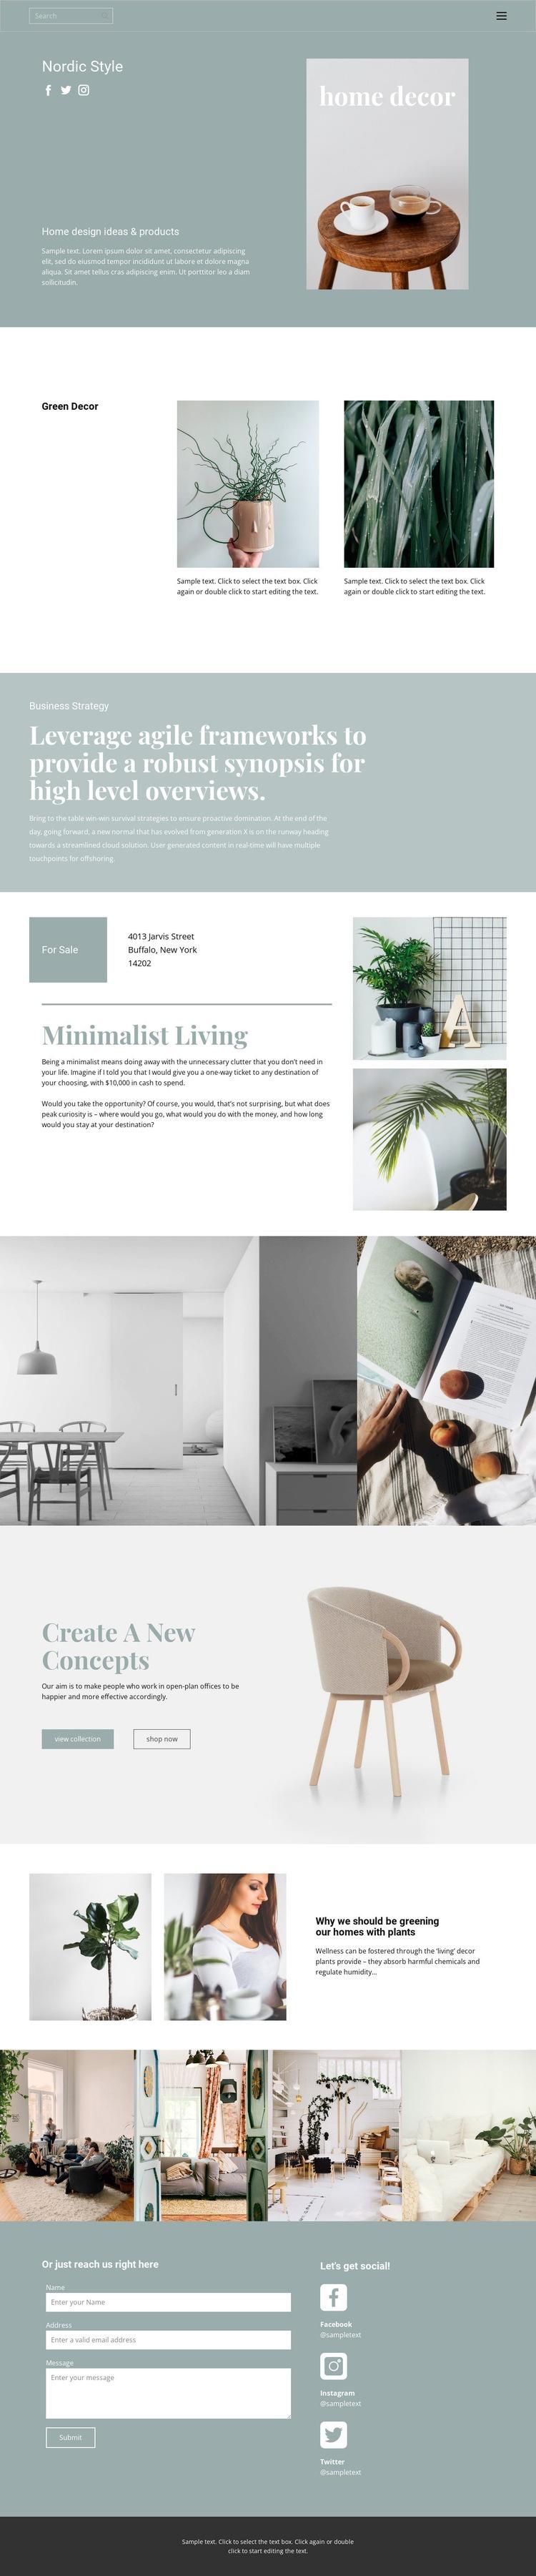 Help interior designer Html Code Example